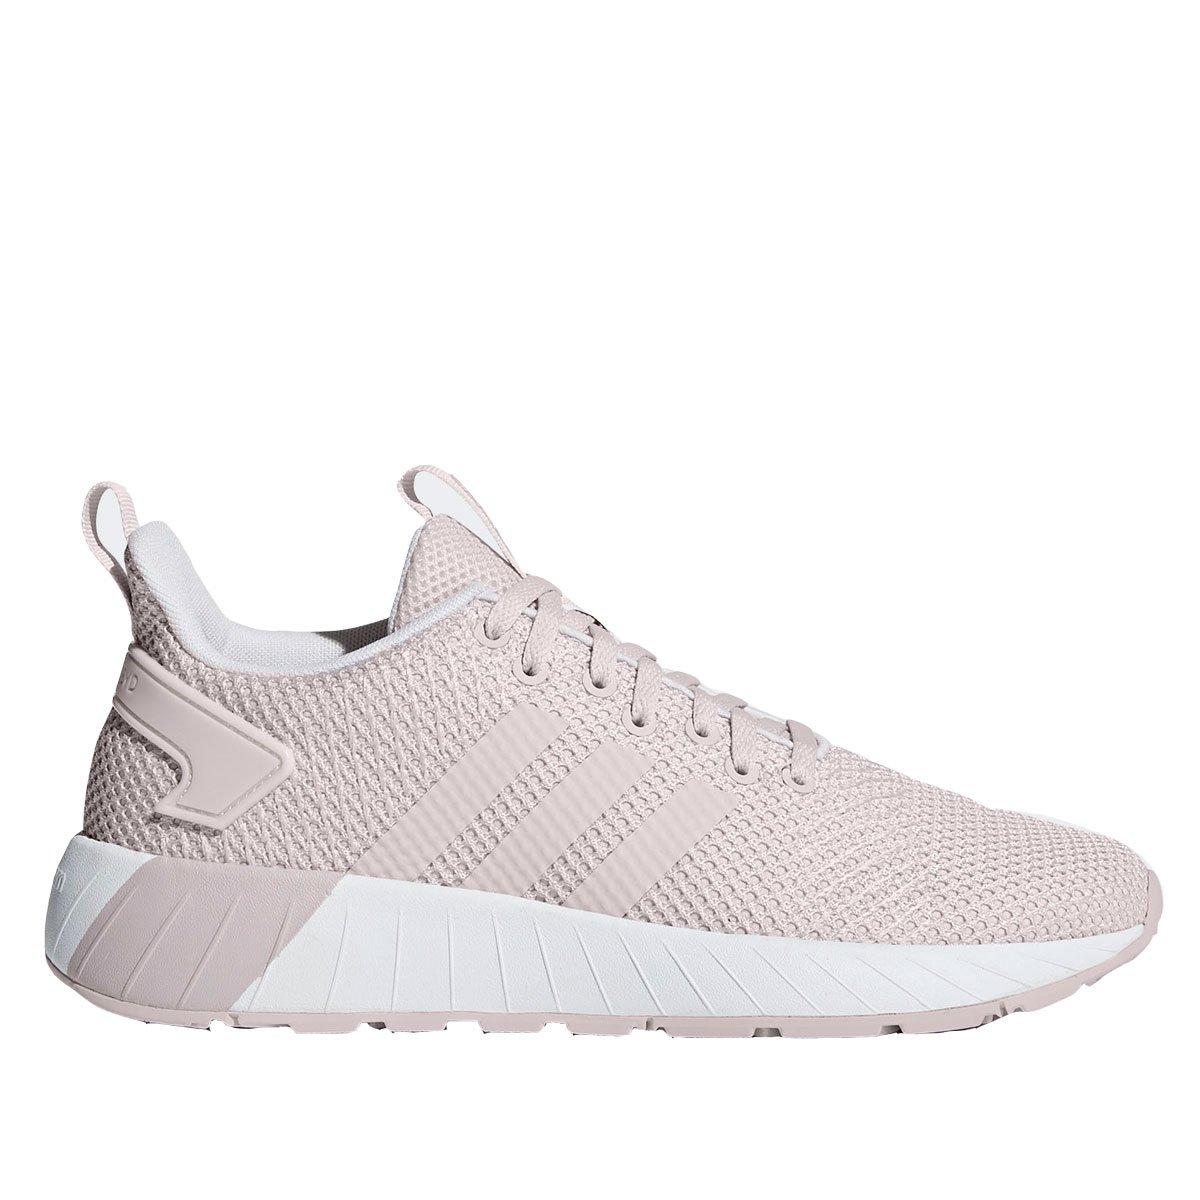 795f91c40ba Bizz Store - Tênis Feminino Adidas Questar BYD